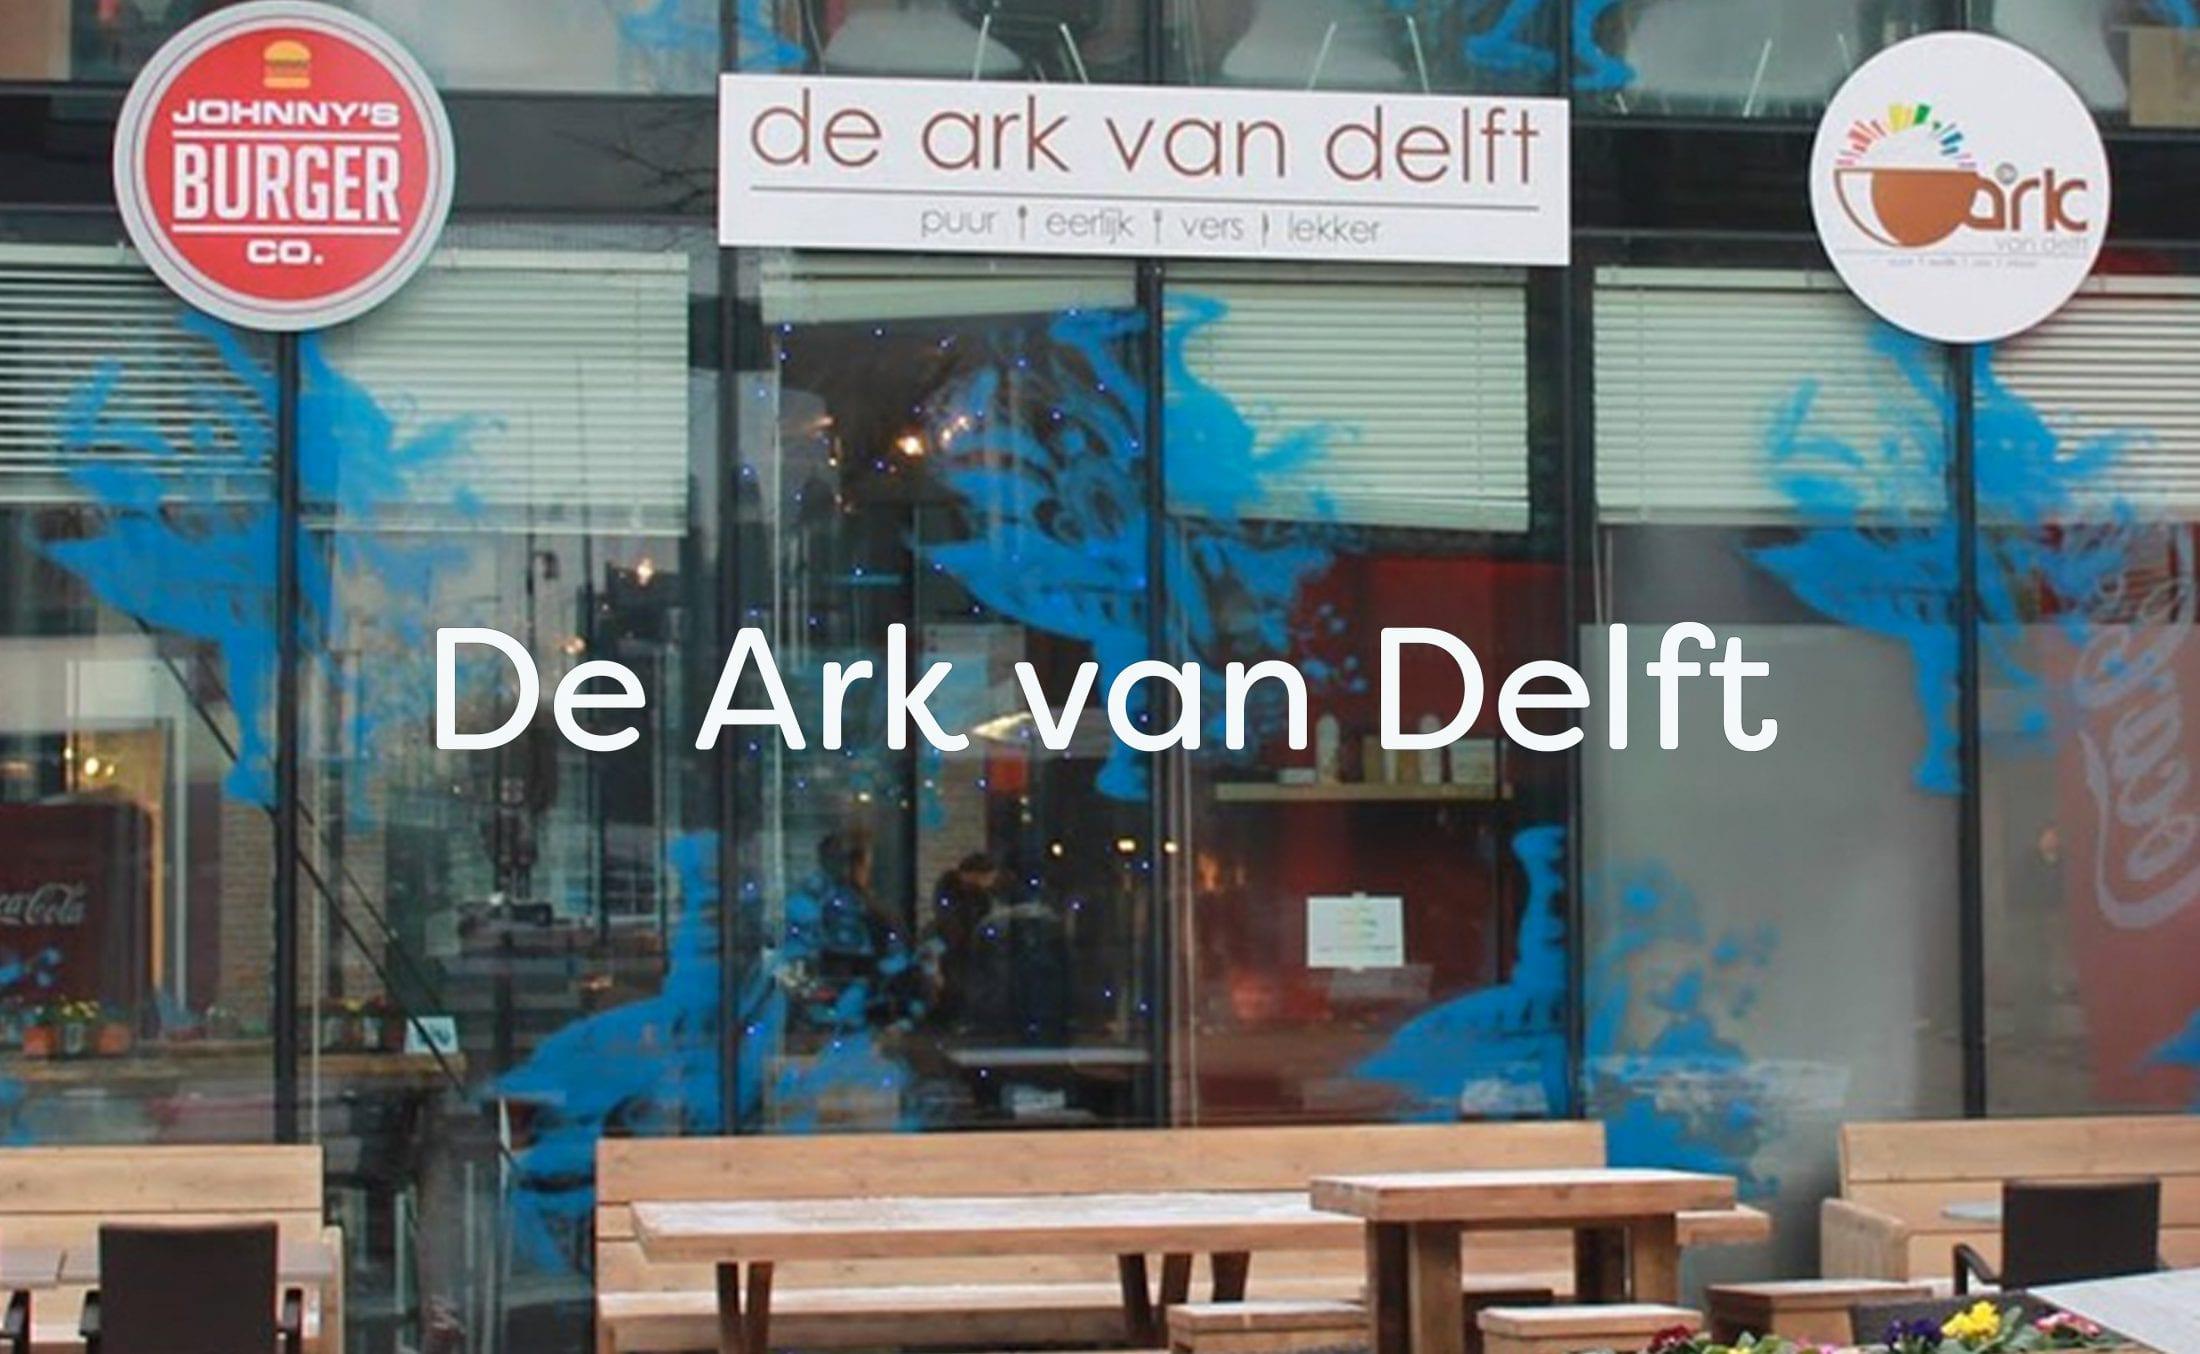 De Ark van Delft